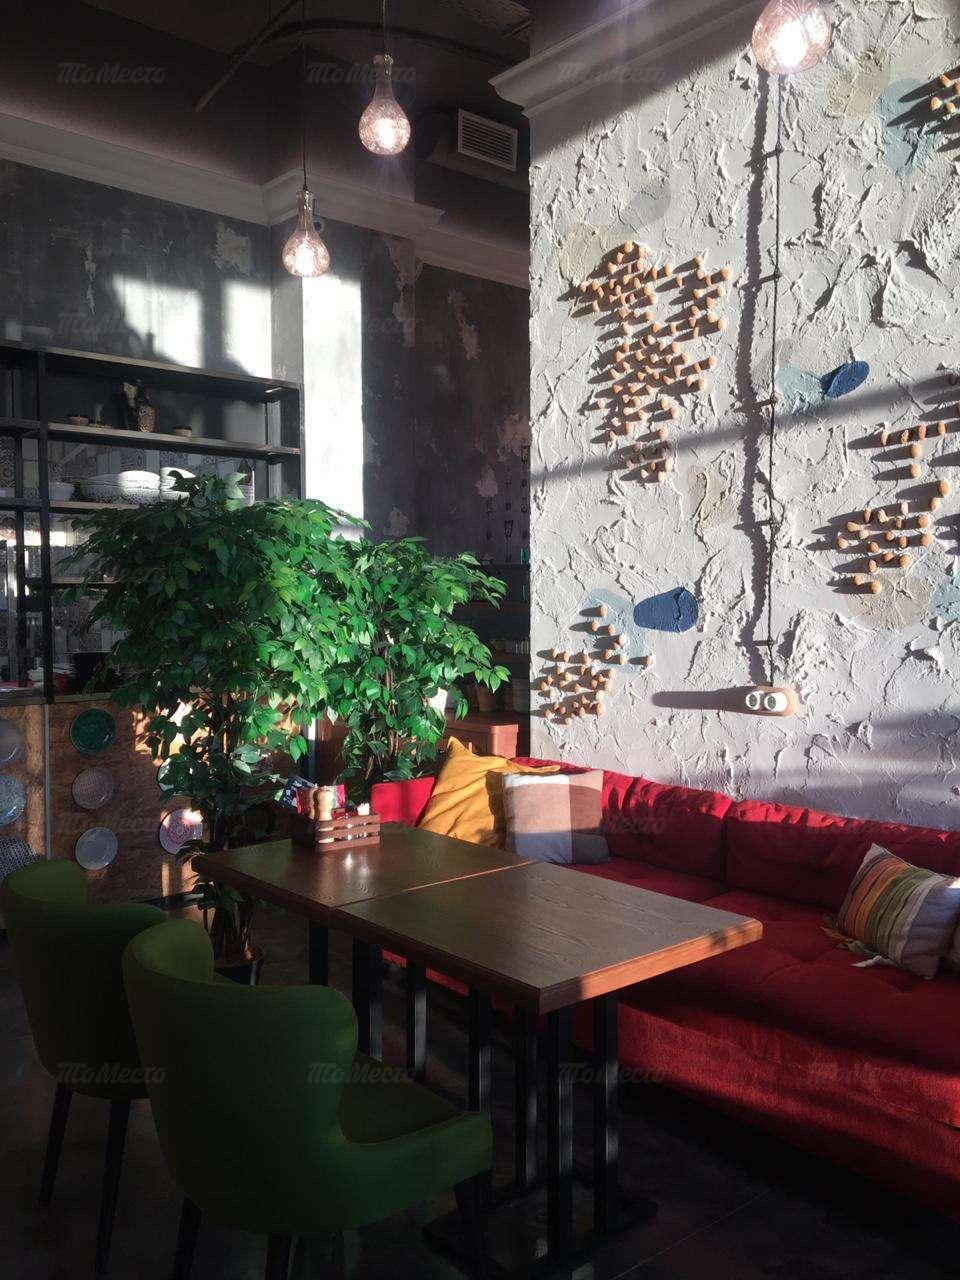 Ресторан Гиви to me (Гиви ту ми) на улице Ткачей